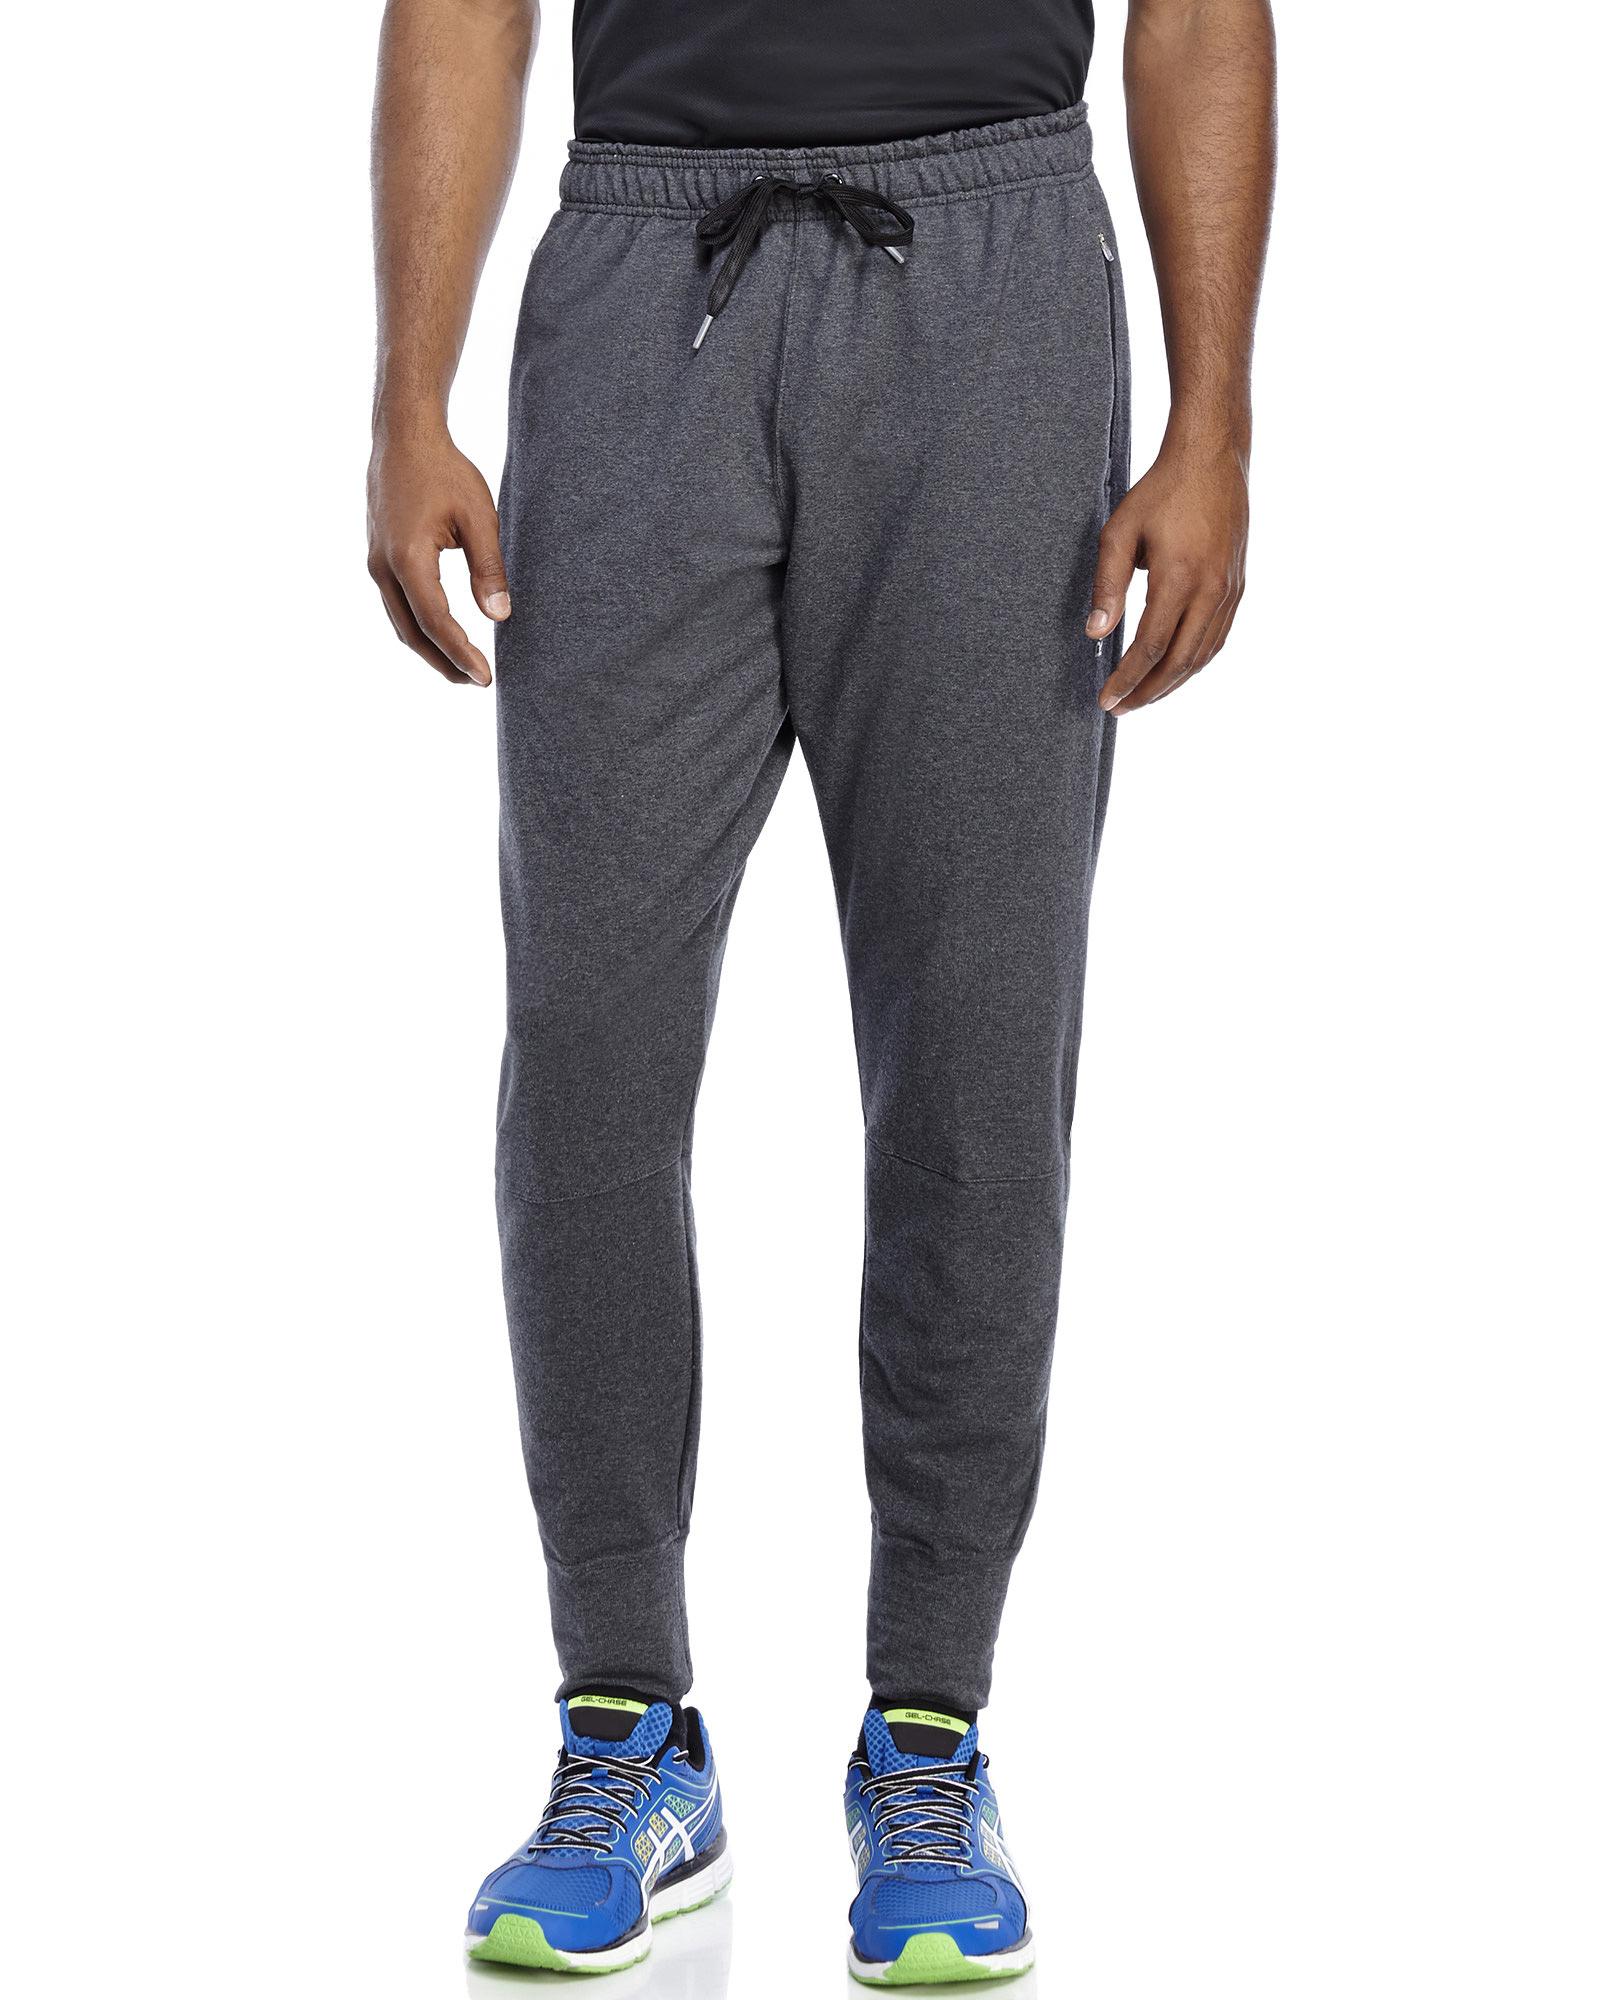 dda049470a Reebok Gray Charcoal Double Time Sweatpants for men